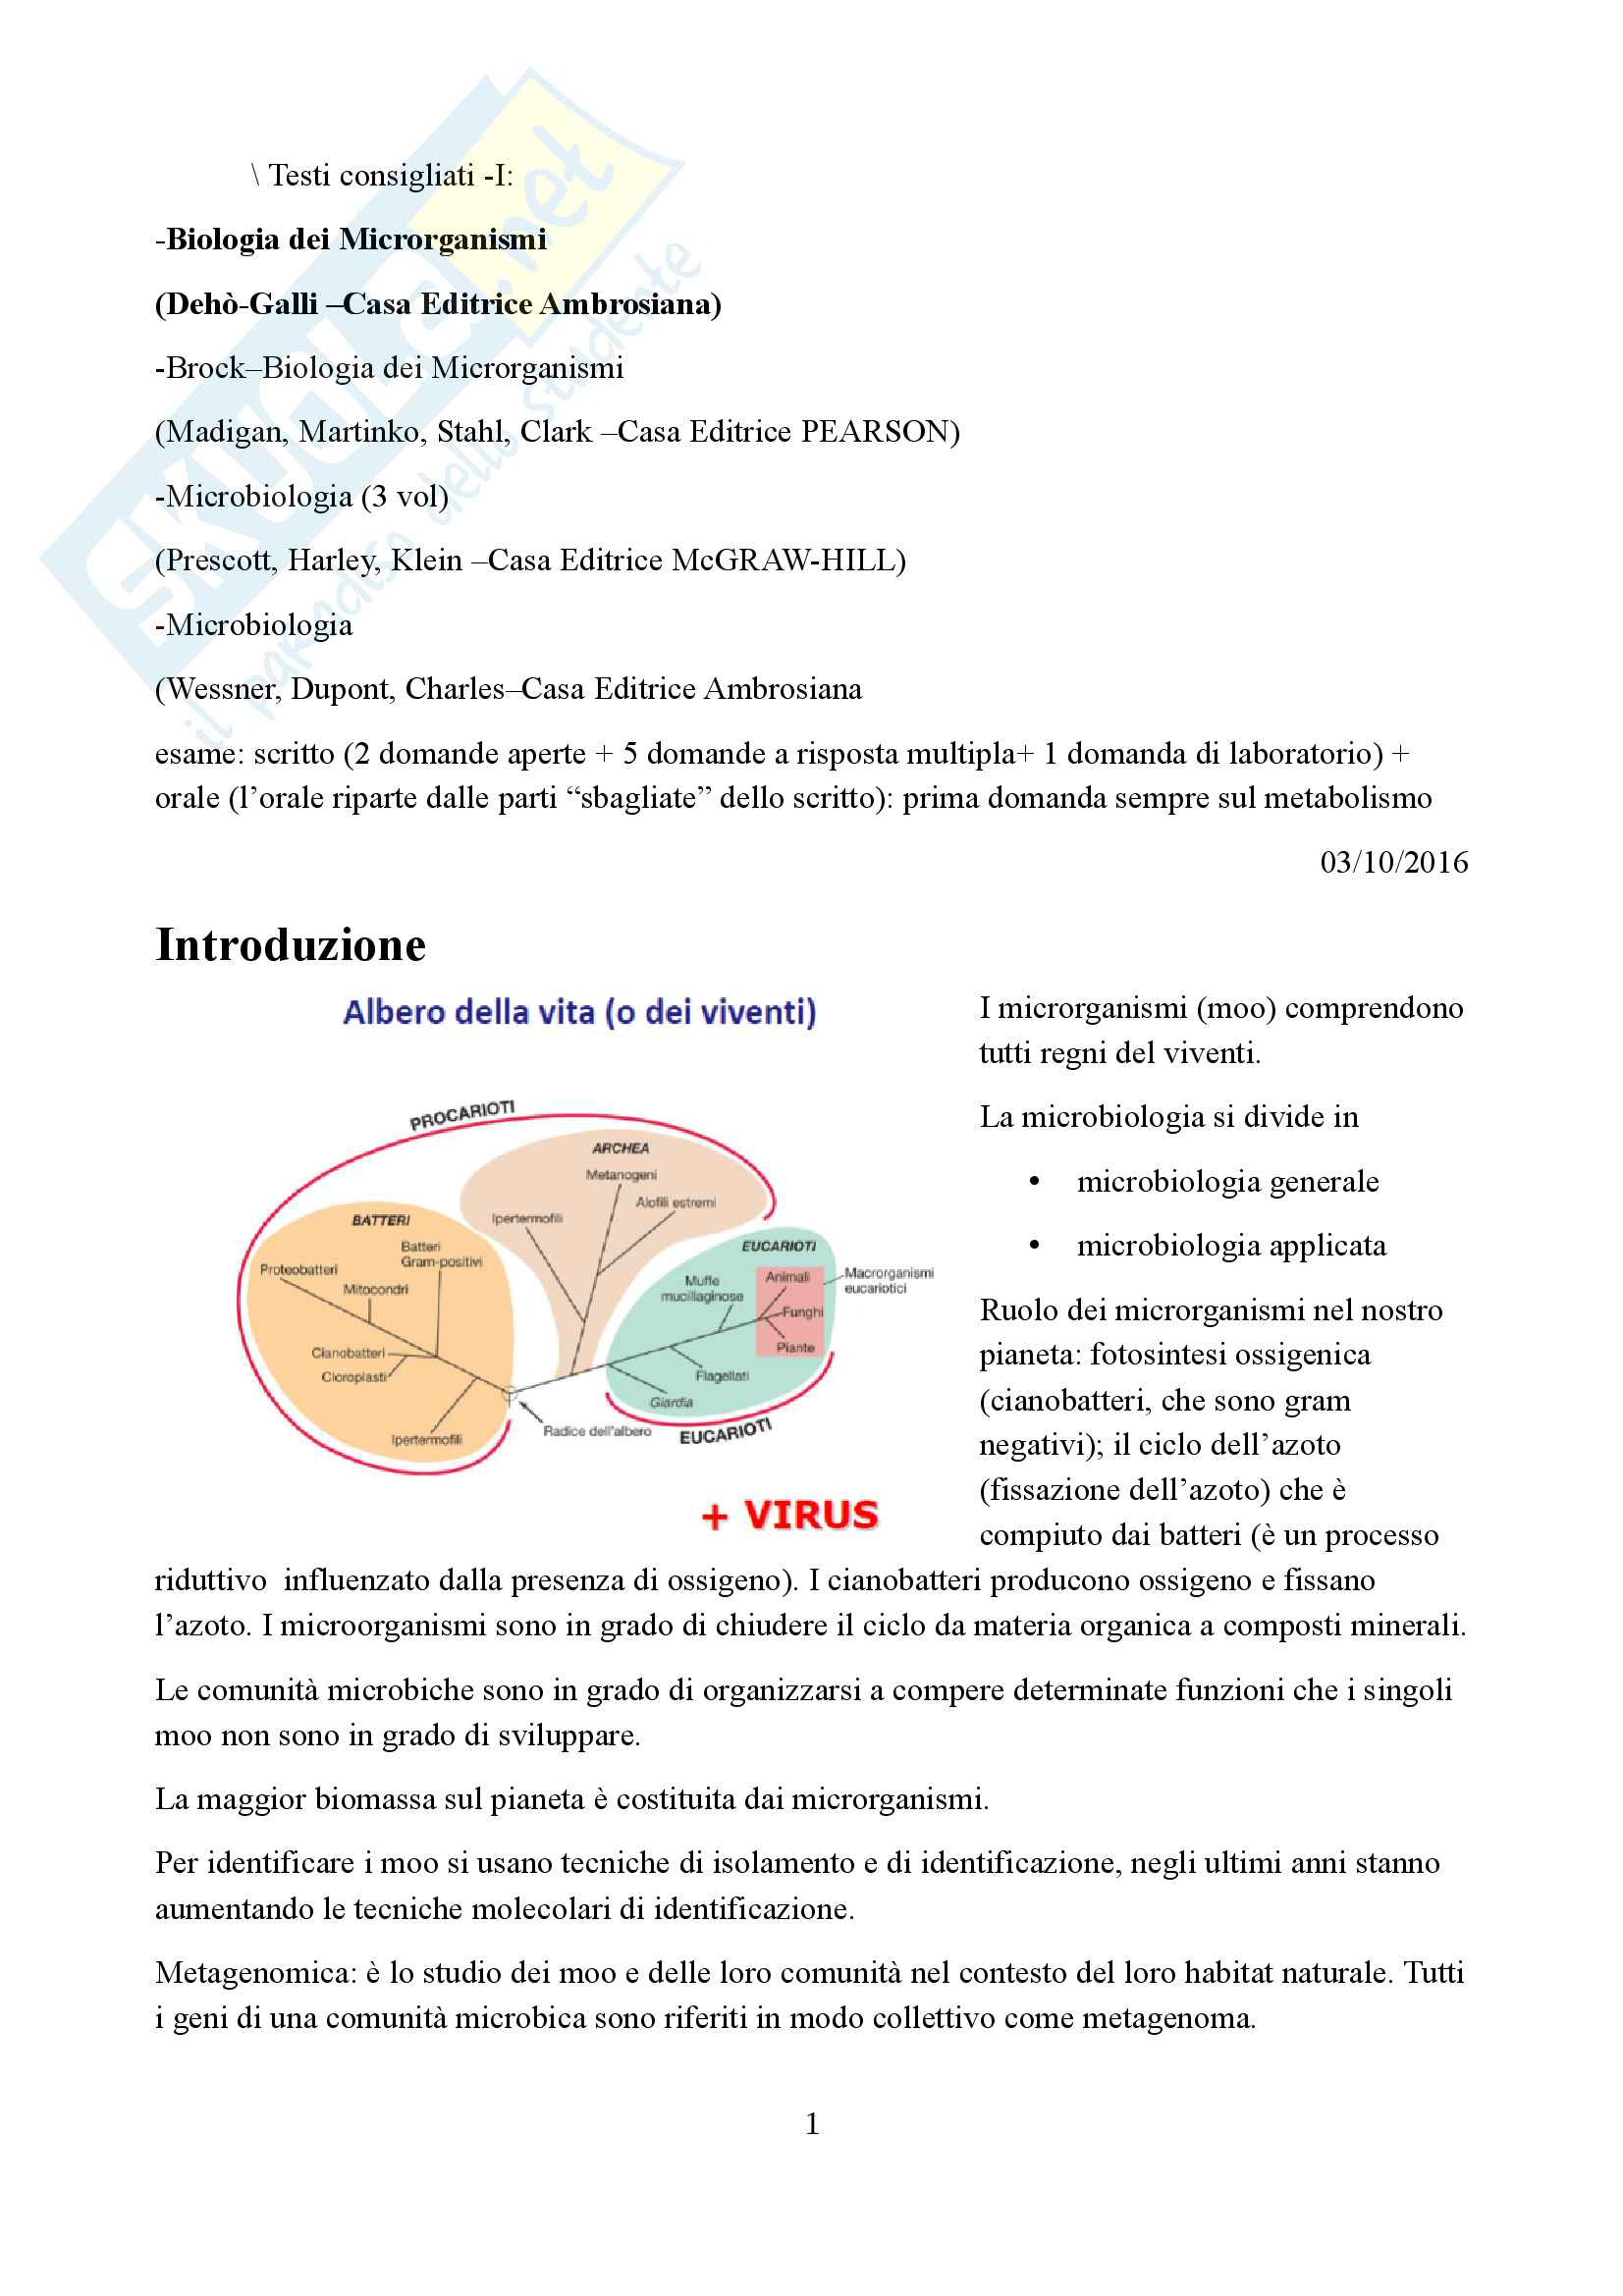 Appunti microbiologia